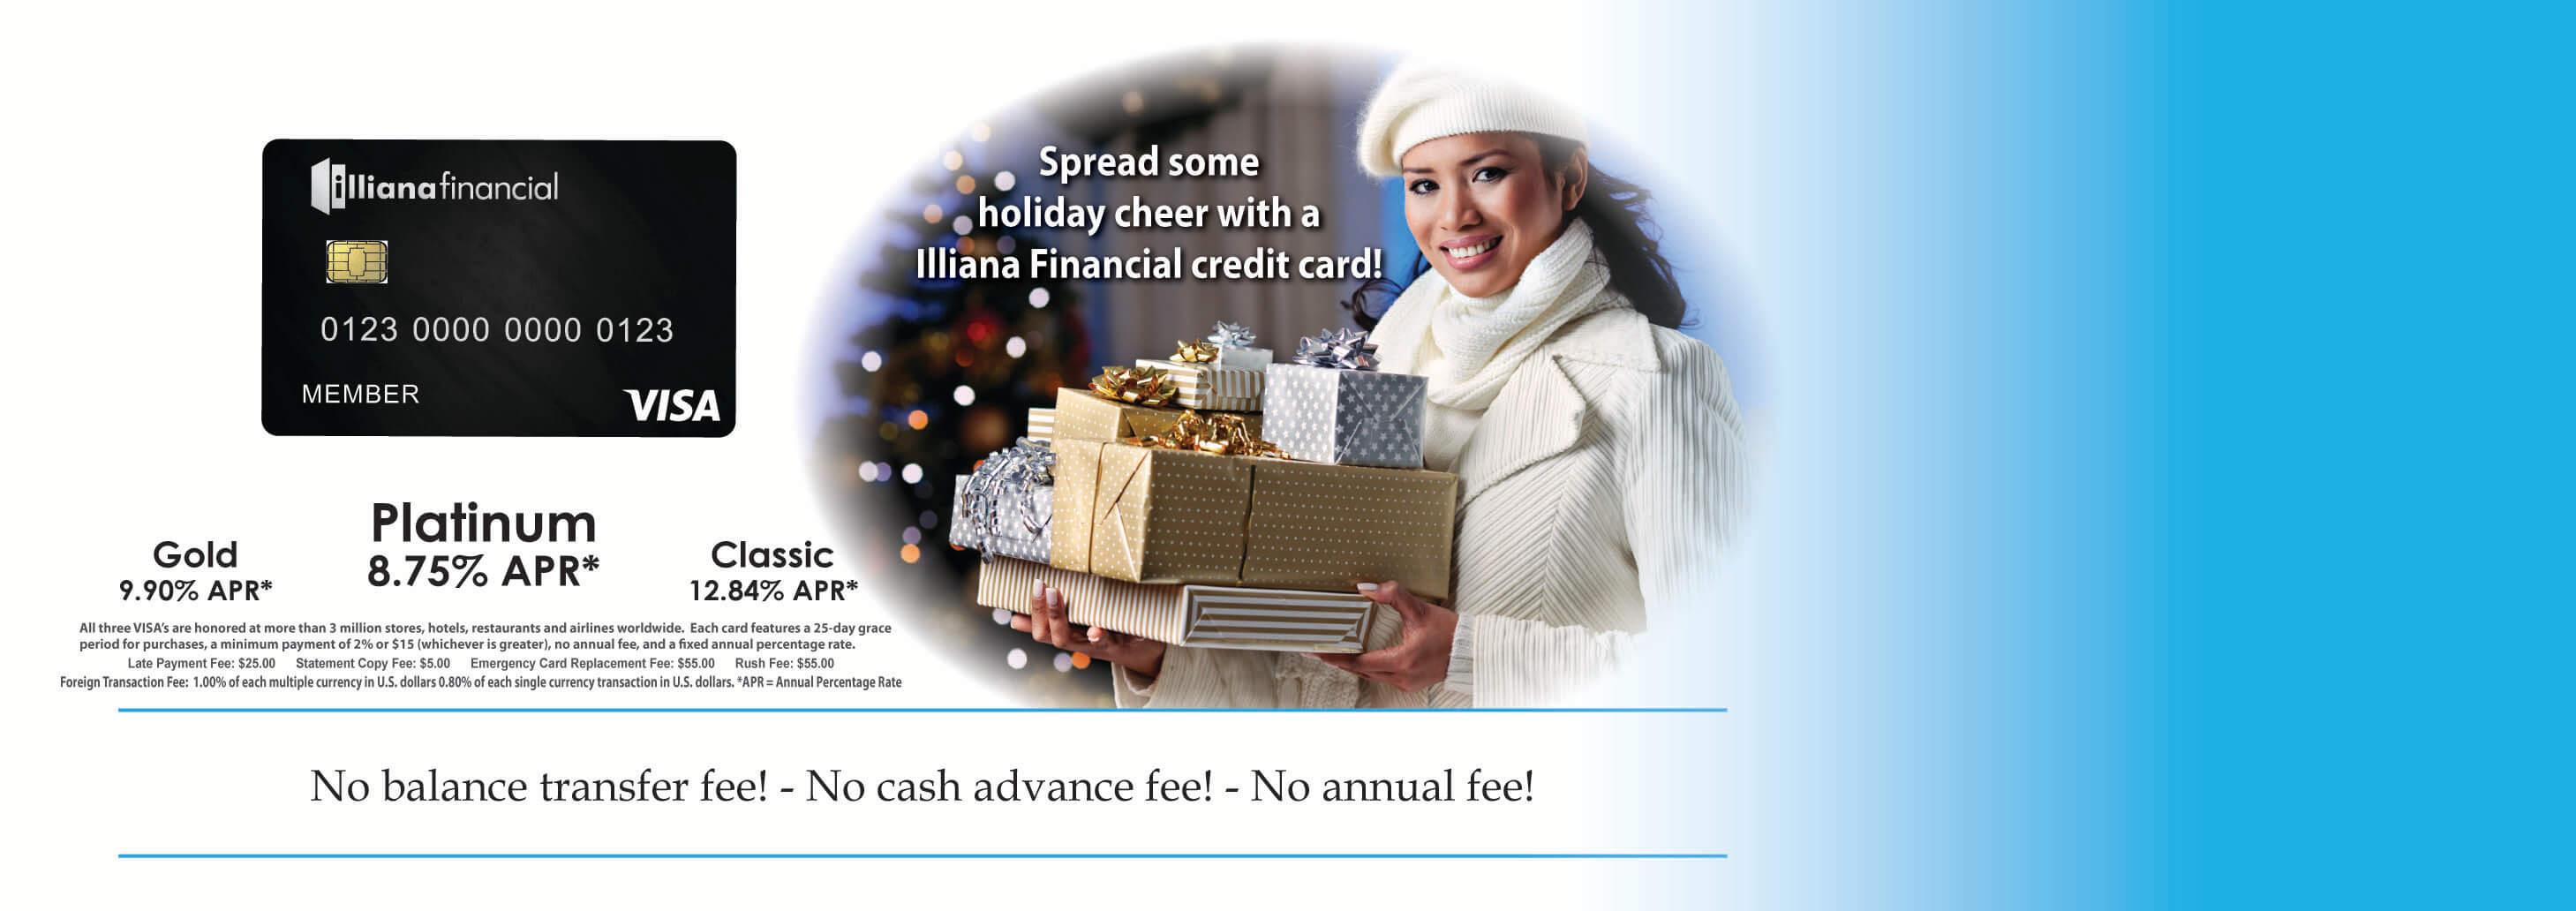 Visa Holiday Credit Card: Gold 9.90% APR, Platinum 8.75% APR, Classic 12.84% APR